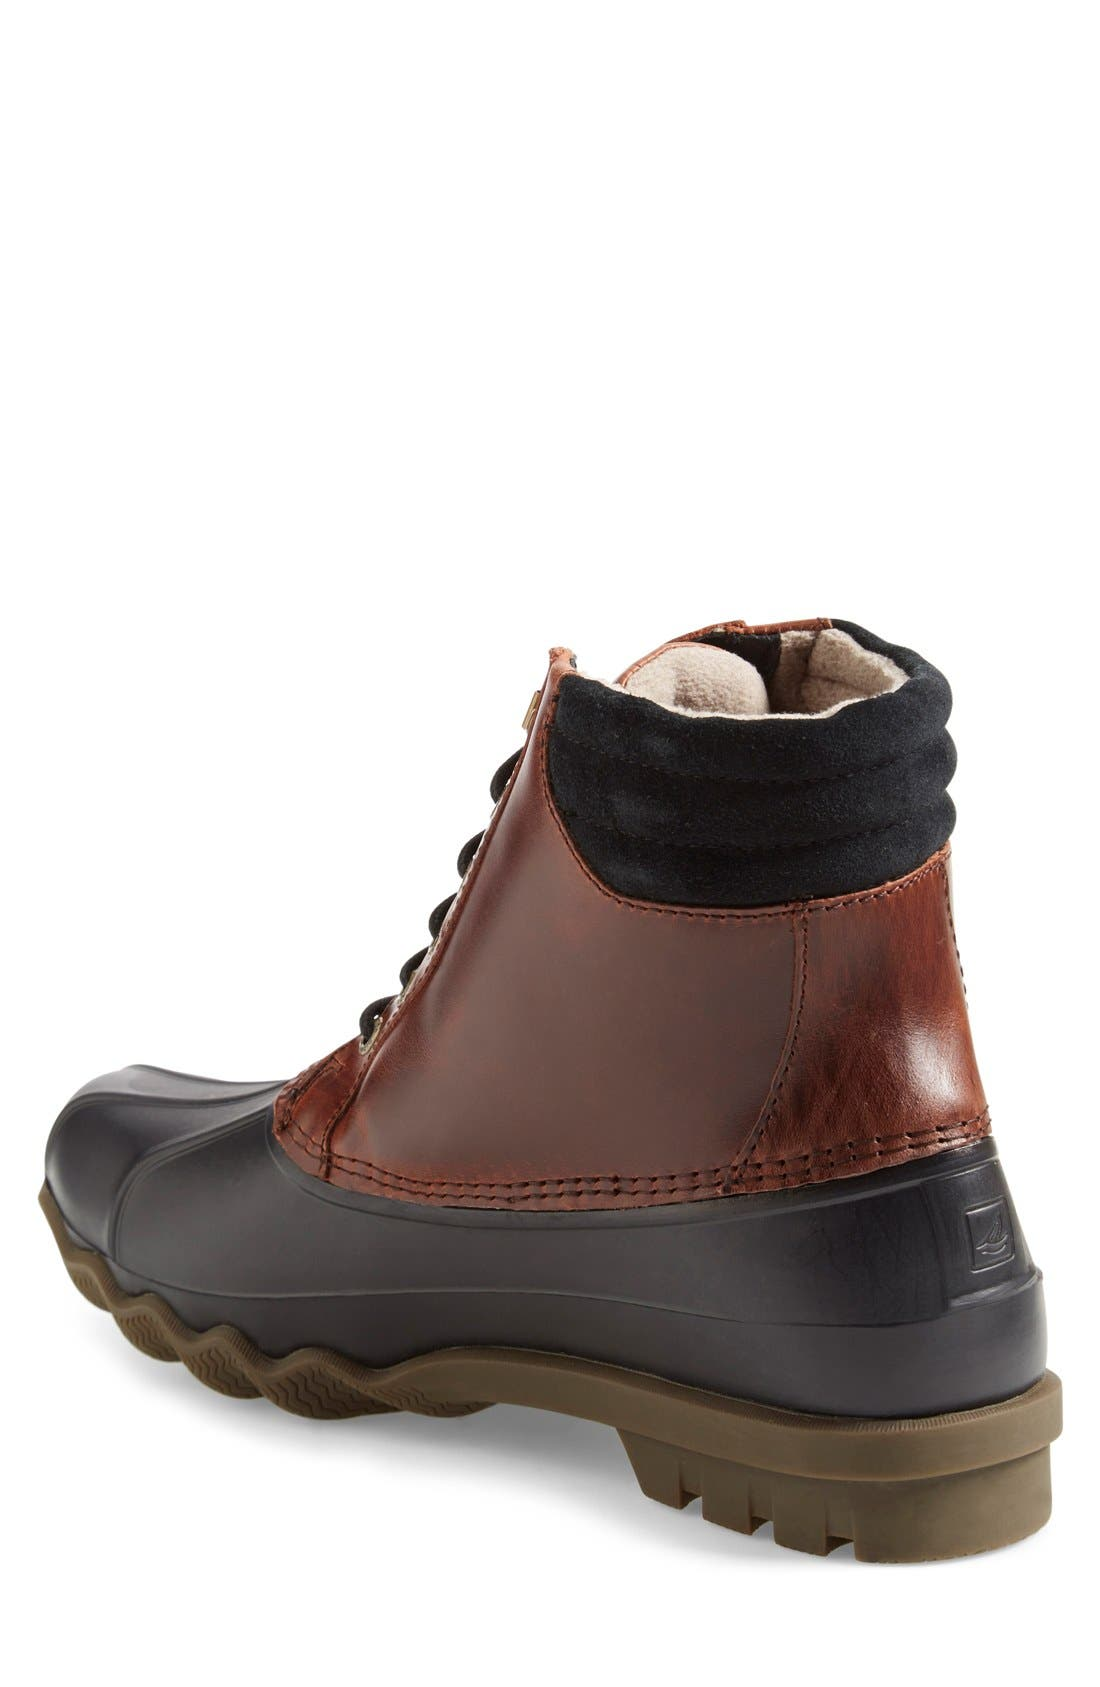 Alternate Image 2  - Sperry Top-Sider® 'Avenue' Rain Boot (Men)